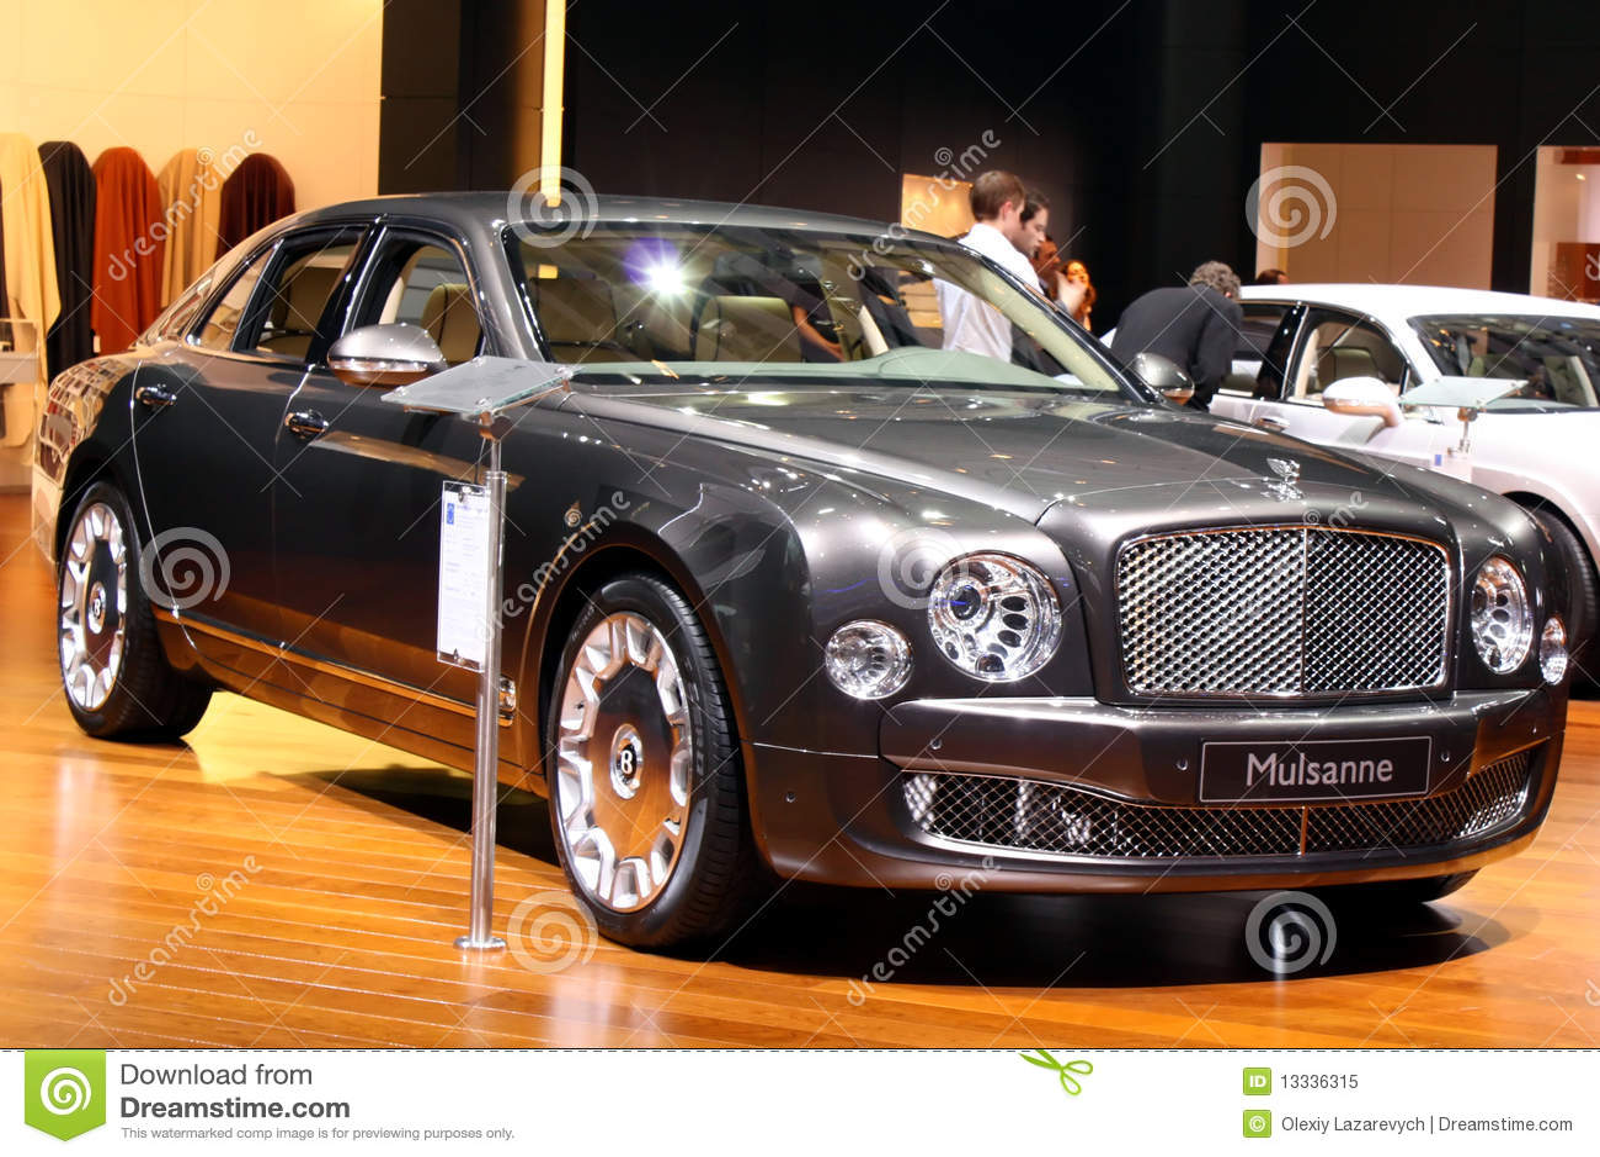 2010 bentley Geneva motorowy mulsanne przedstawienie